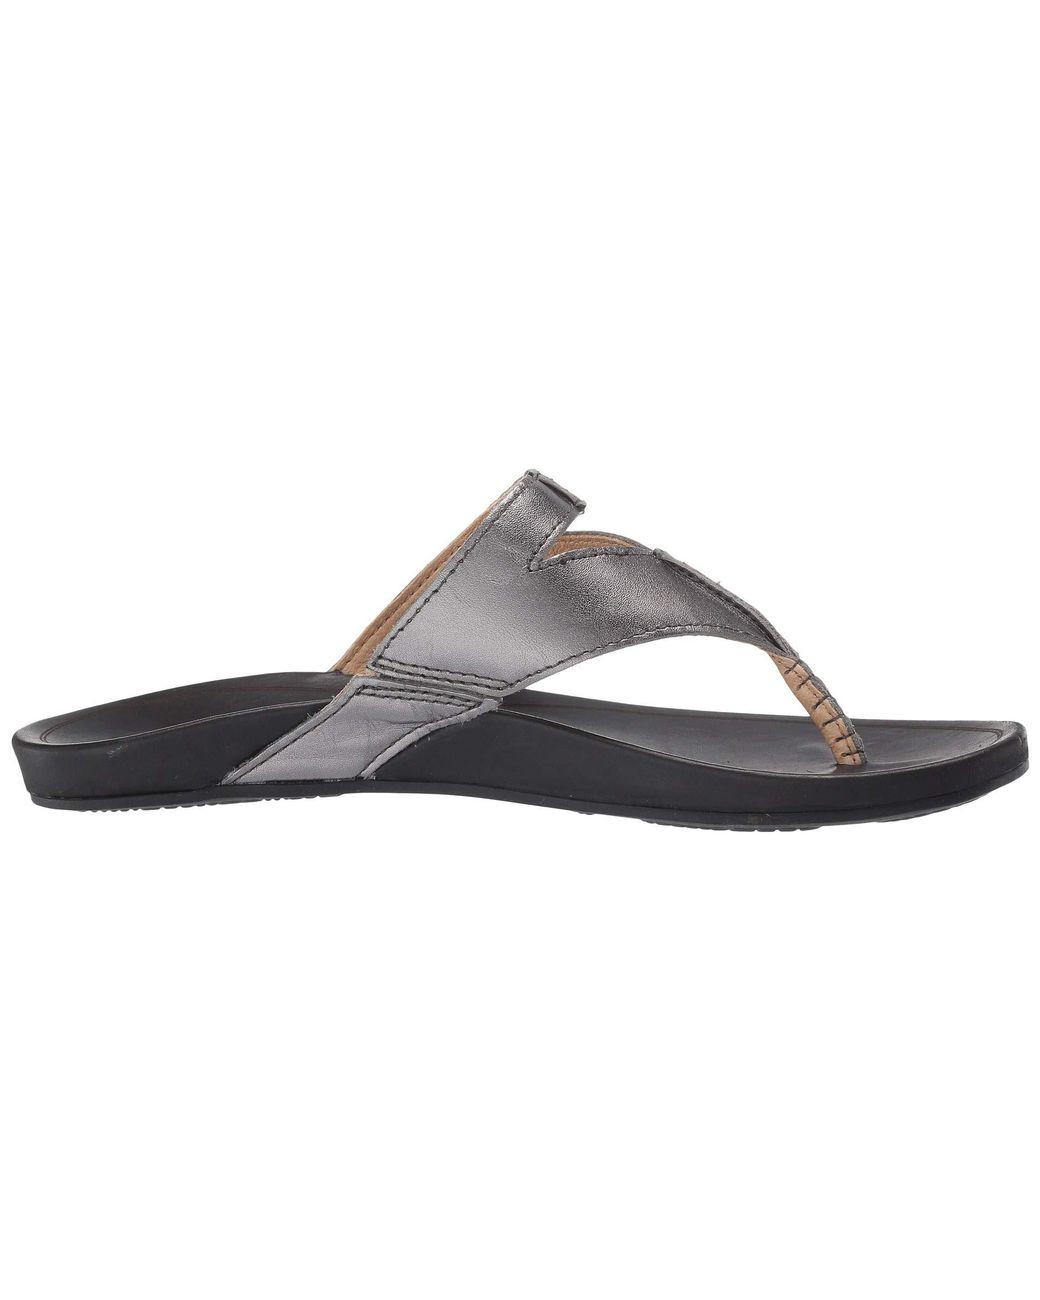 8540e8ad006 Lyst - Olukai Lala (black tan) Women s Sandals in Black